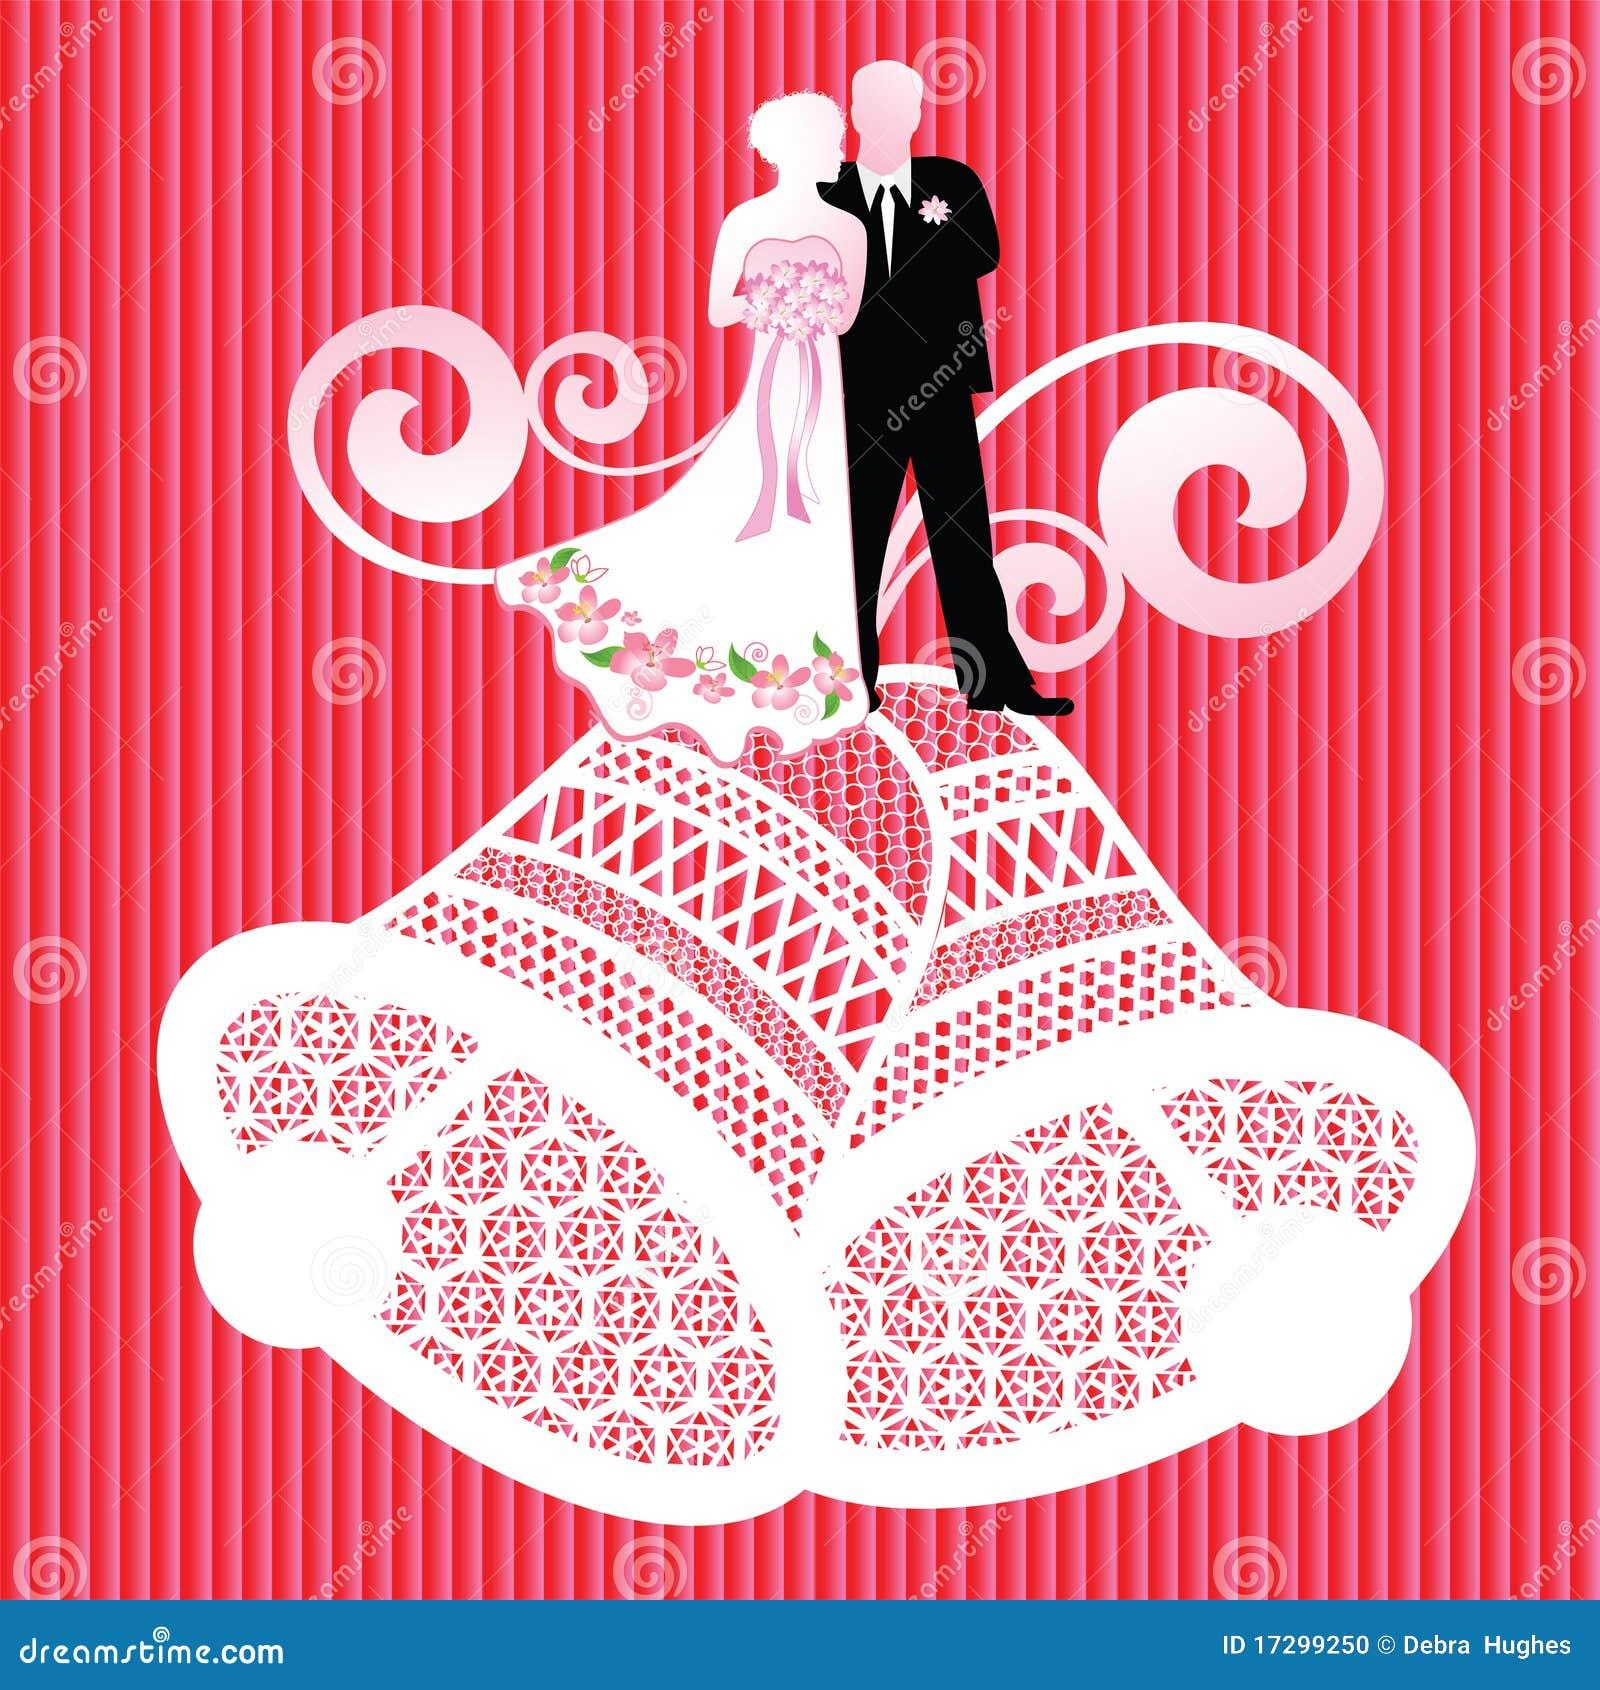 Bride And Groom On Wedding Bells Stock Photo Image 17299250